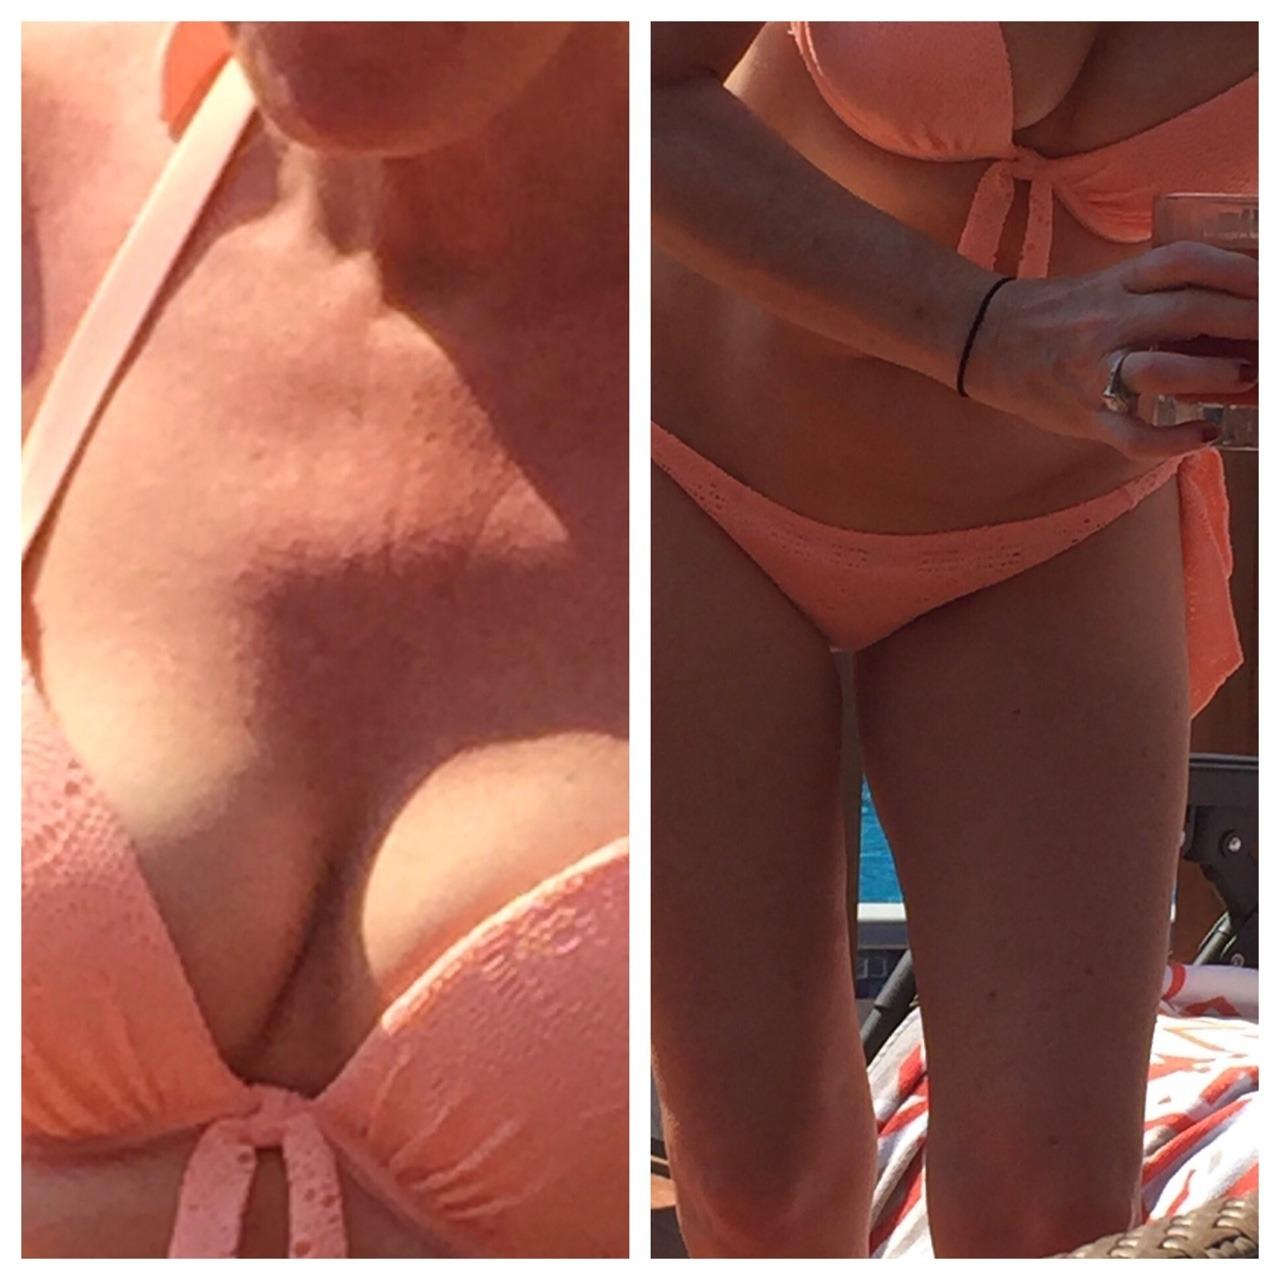 My Hotwife in her Bikini Love Summer